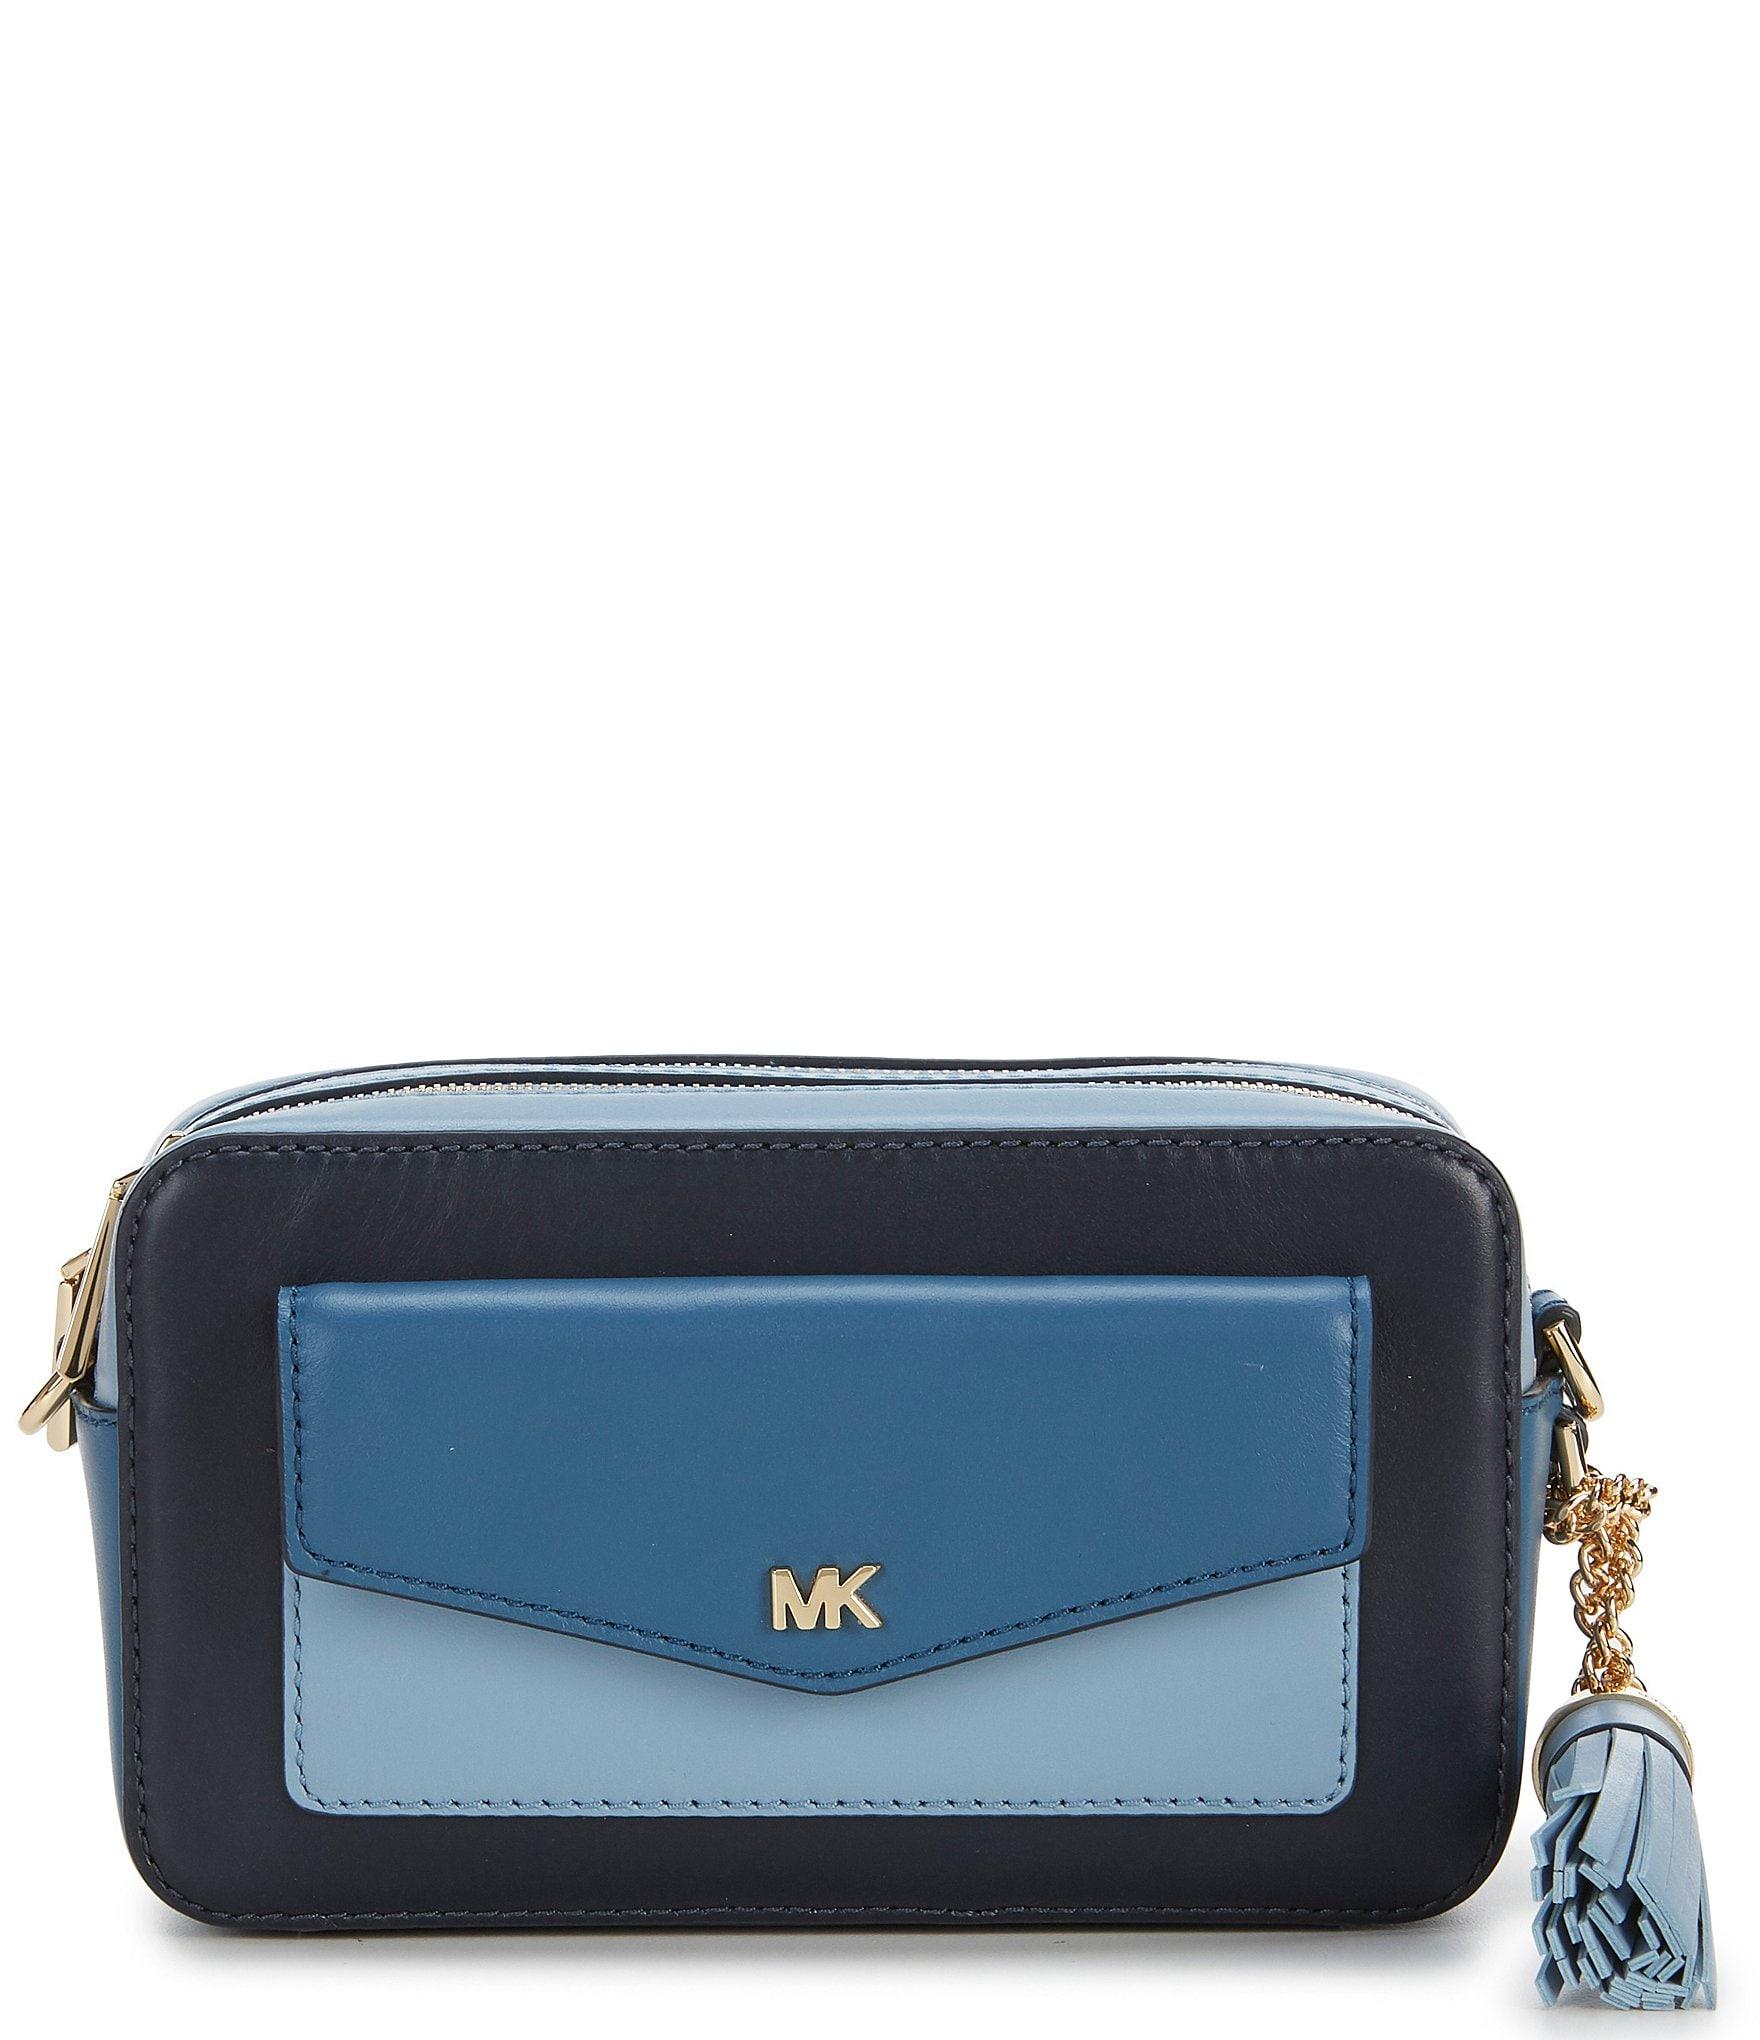 72a2614d3b25d7 michael michael kors sale: Handbags, Purses & Wallets | Dillard's